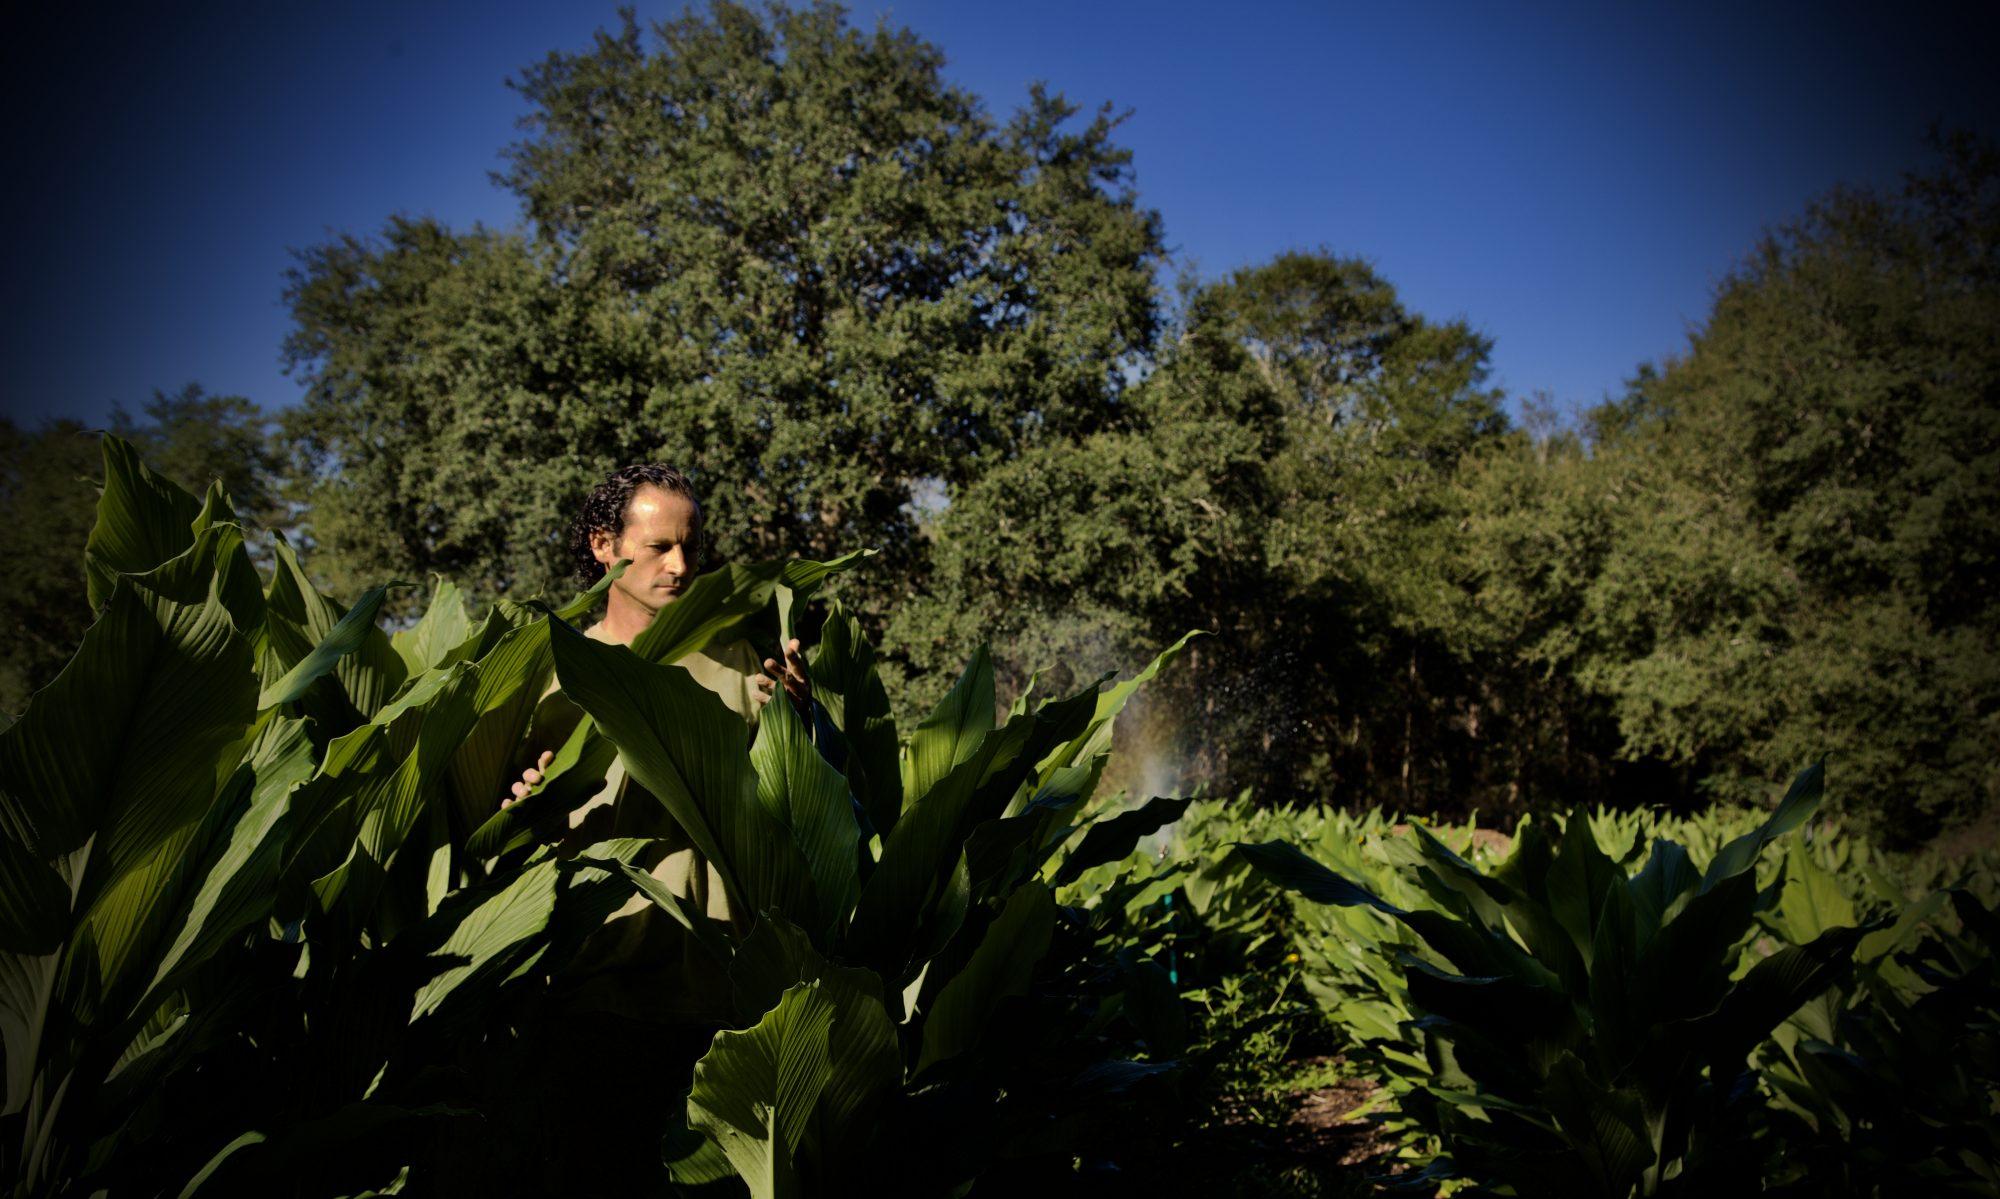 The Greenman's Garden